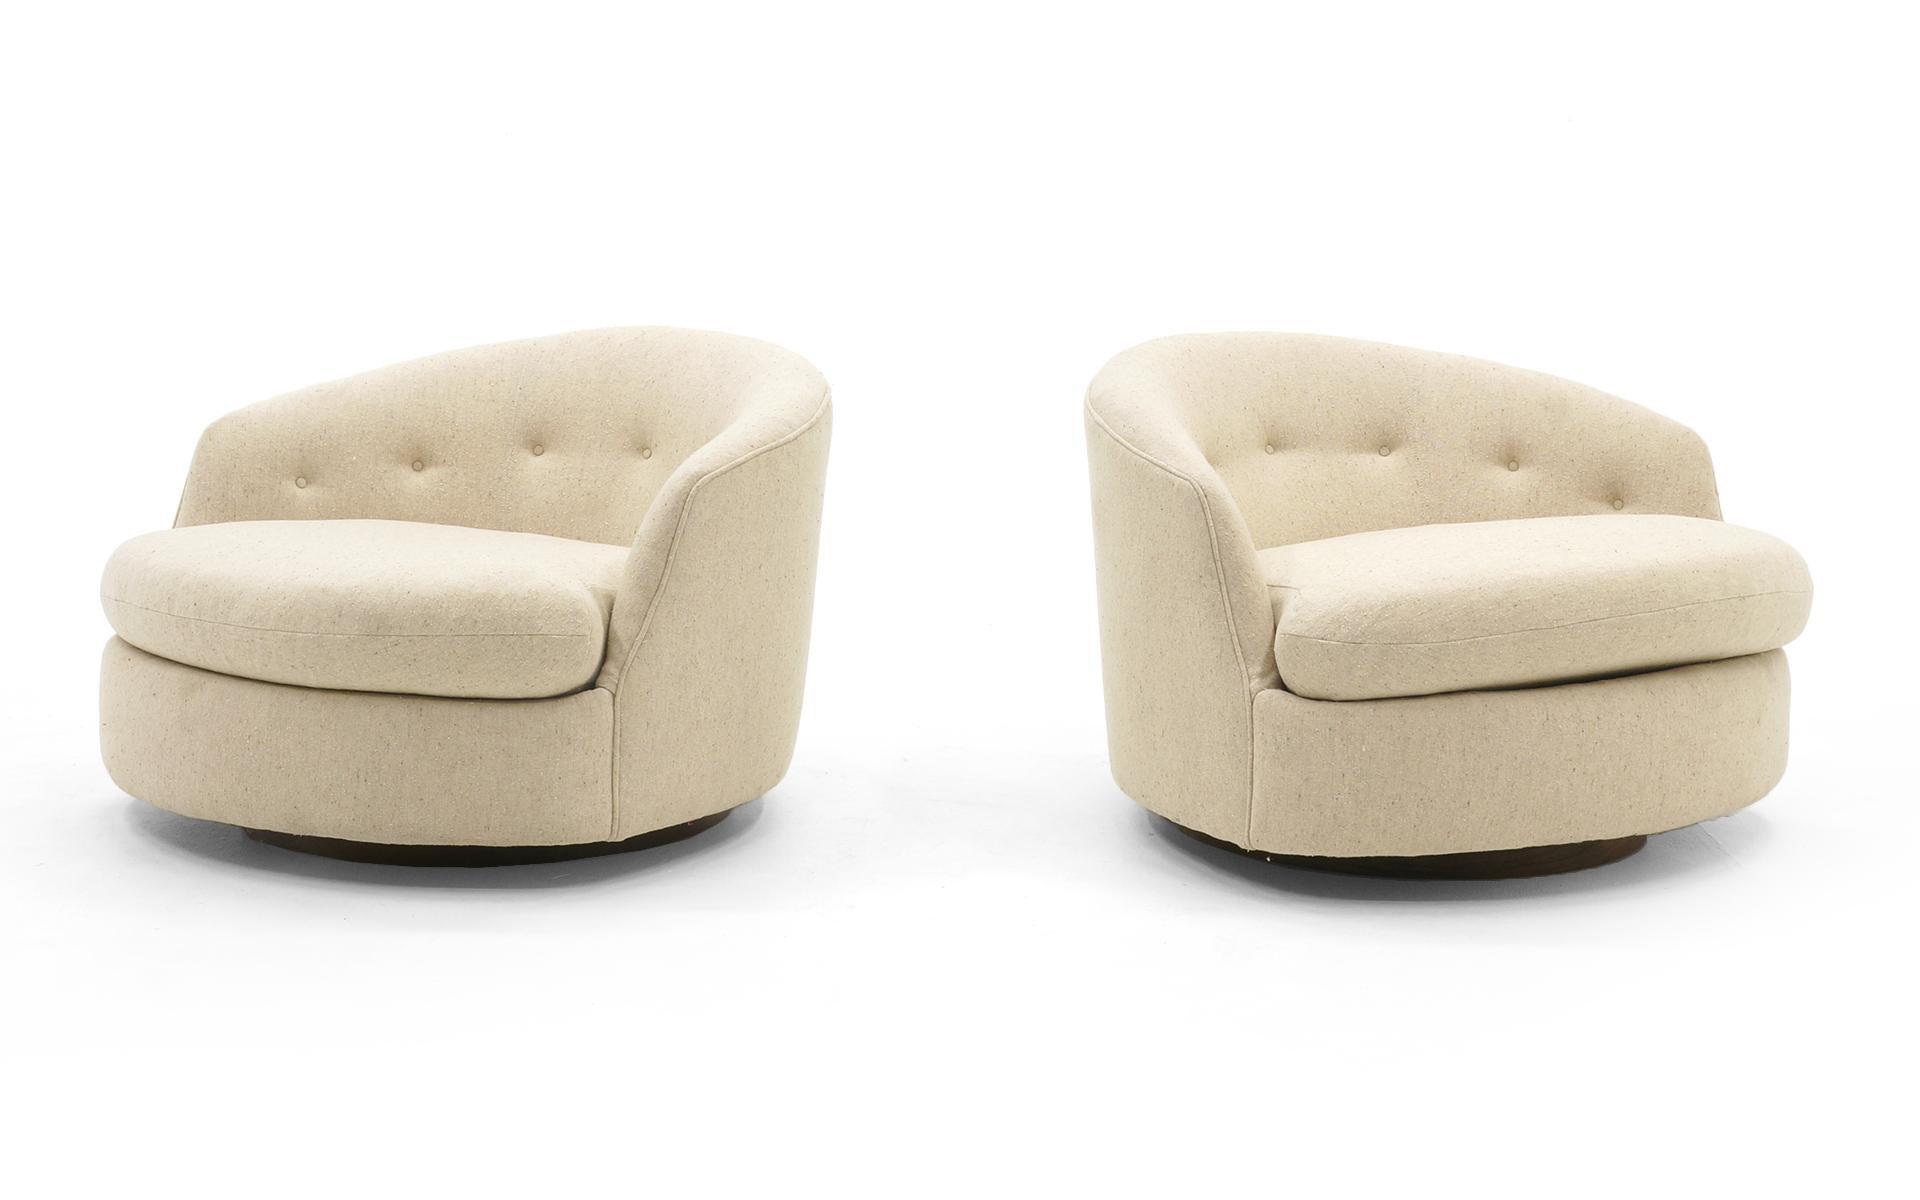 Rare Pair Of Large Round Milo Baughman Swivel Club Chairs